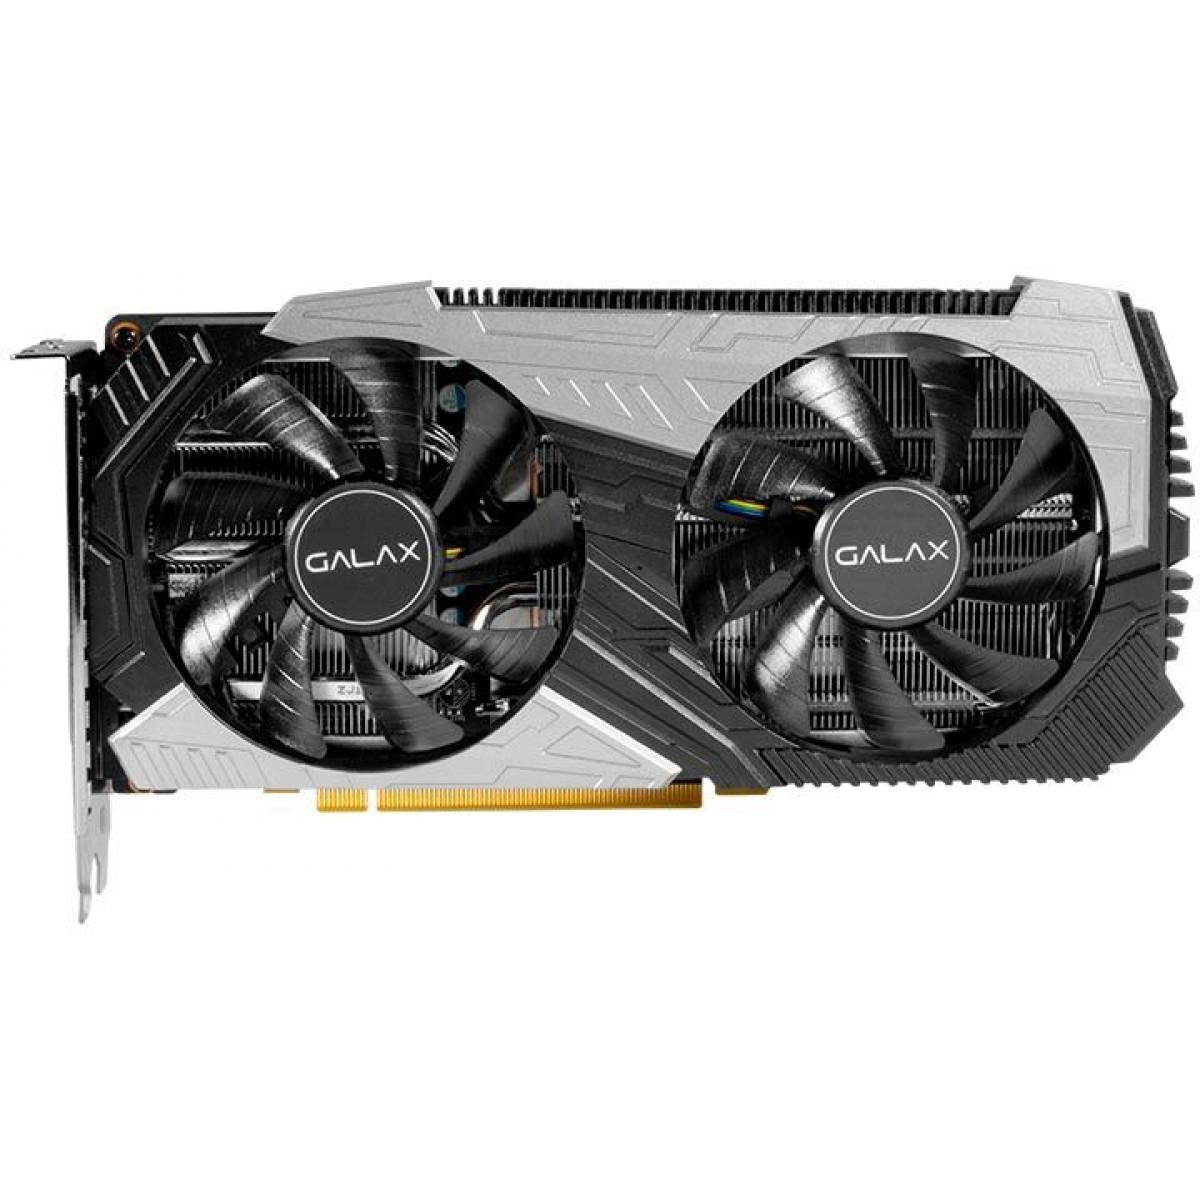 Placa de Vídeo Galax GeForce RTX 2060 Super (1-Click OC), 8GB GDDR6, 256Bit, 26ISL6HP39SS